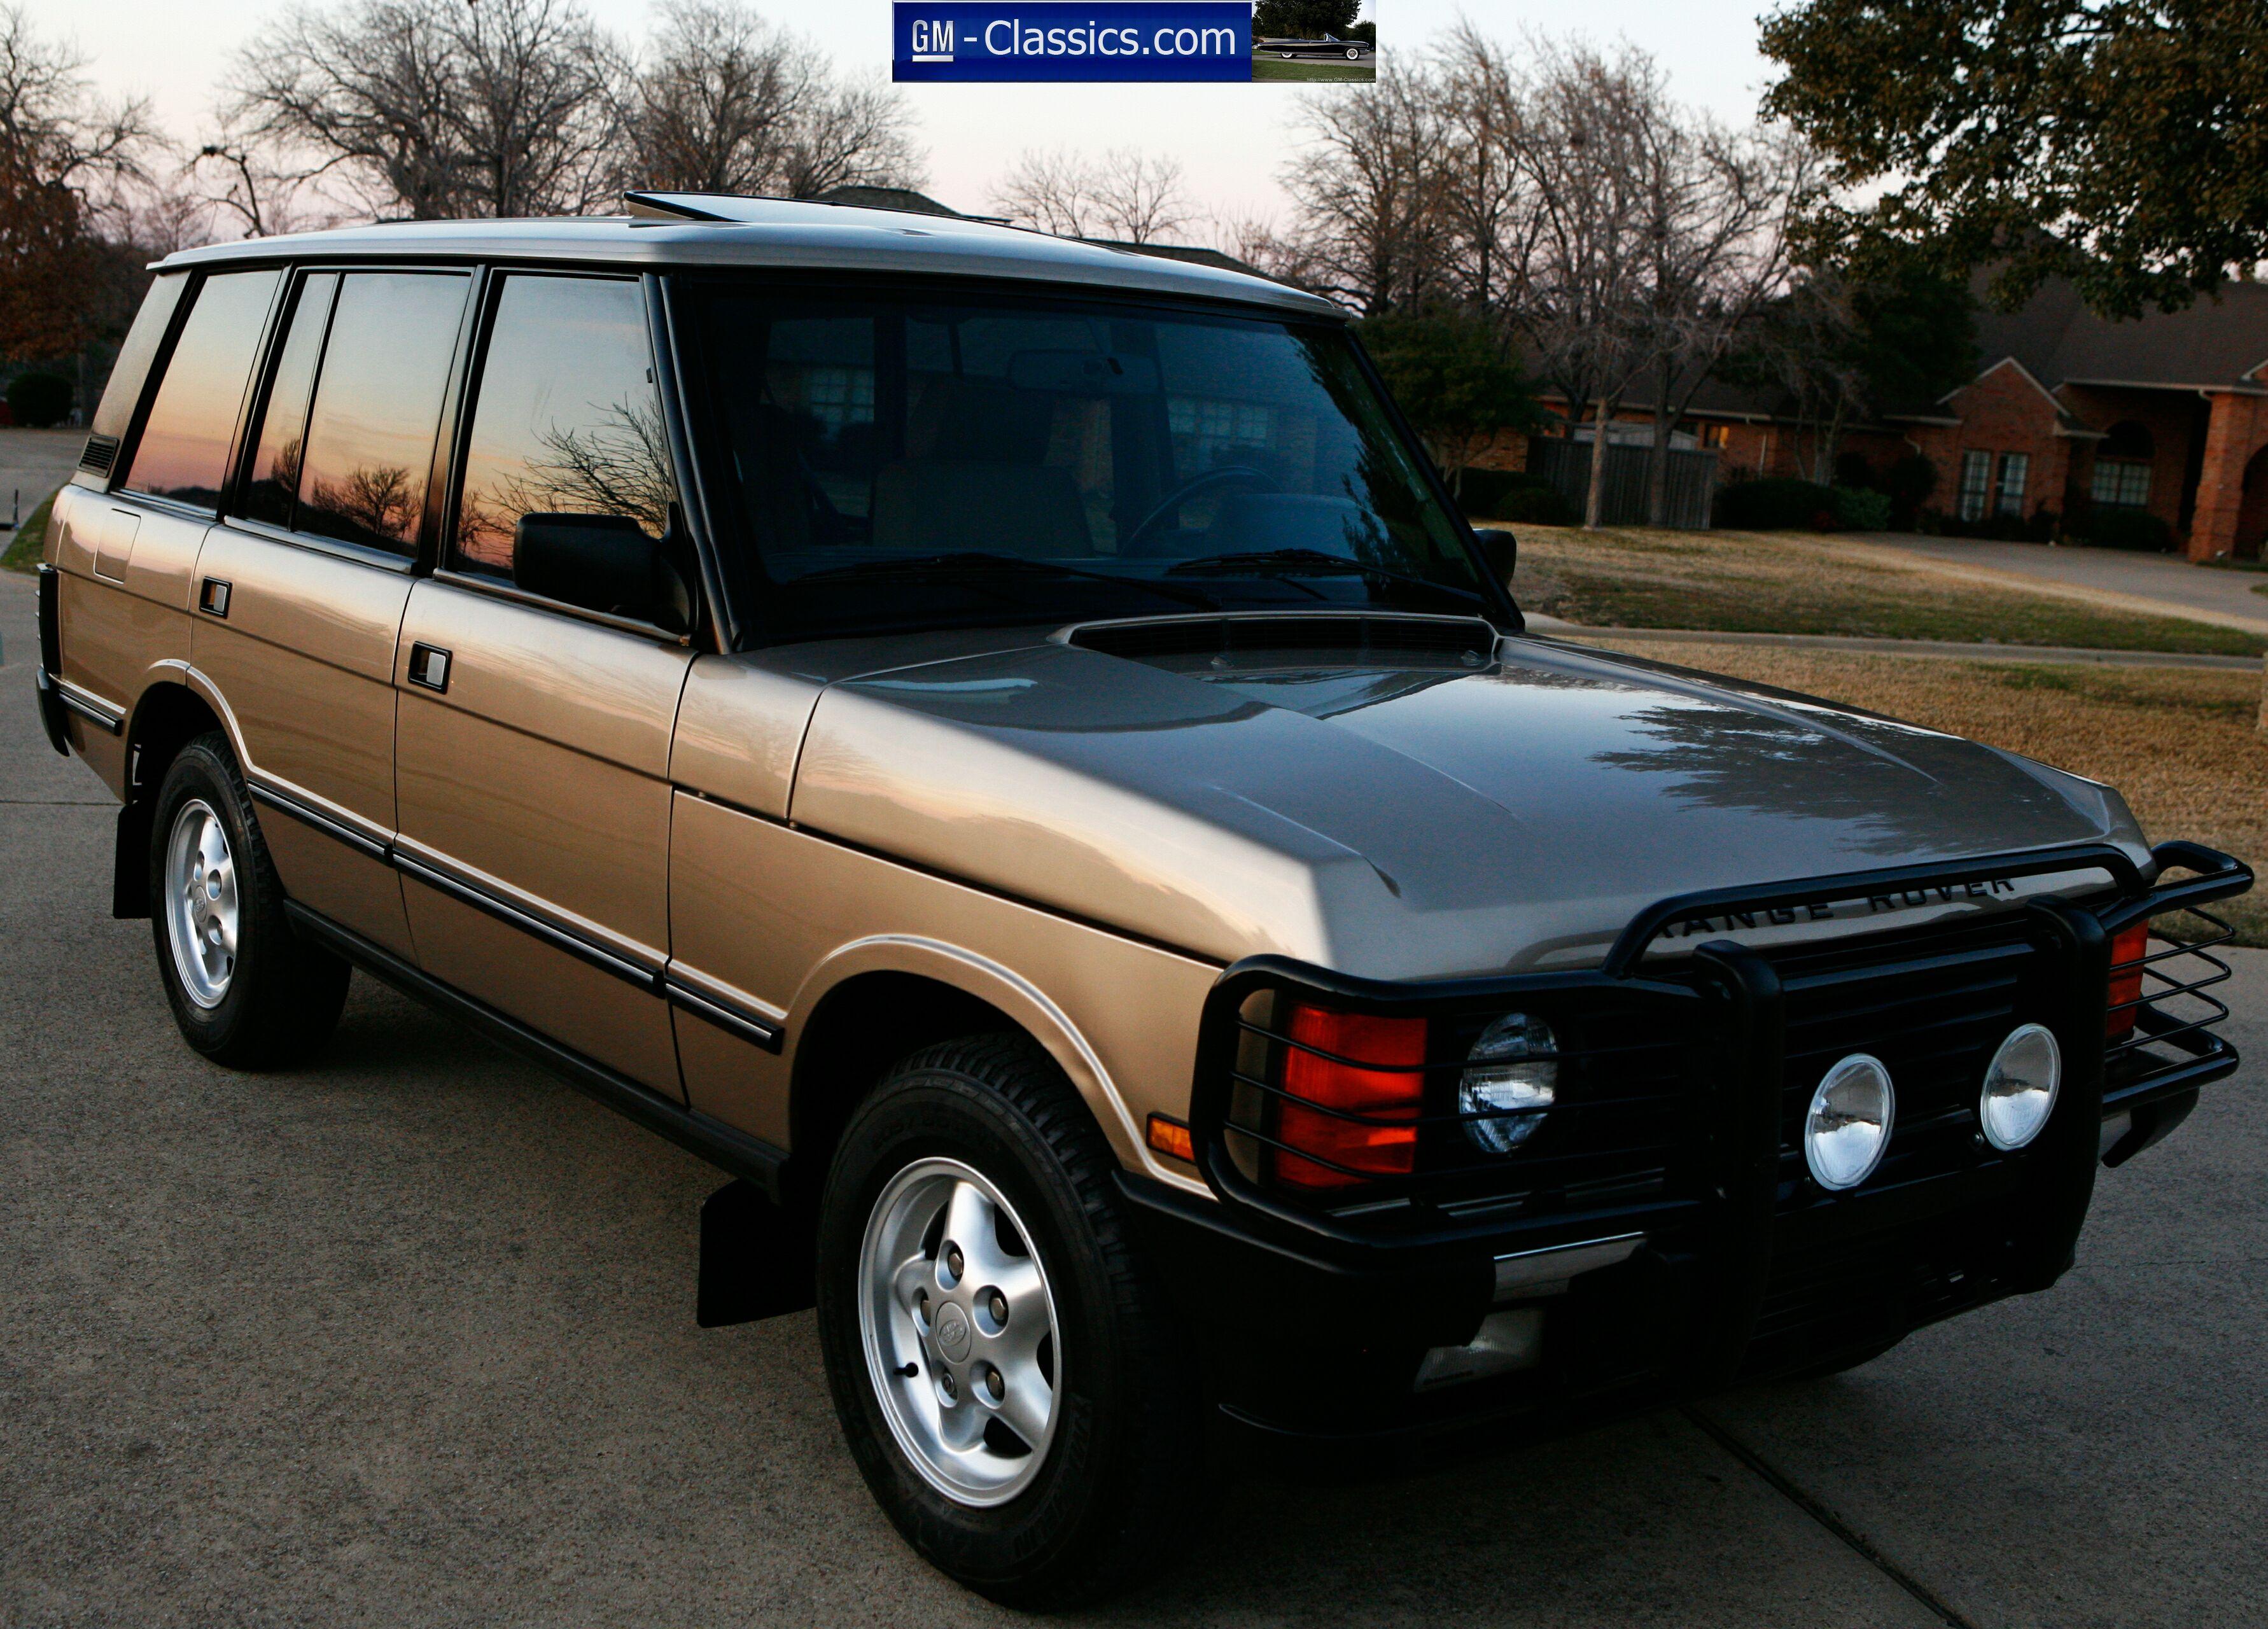 Range Rover Dallas >> 1995 Range Rover County LWB - Matt Garrett